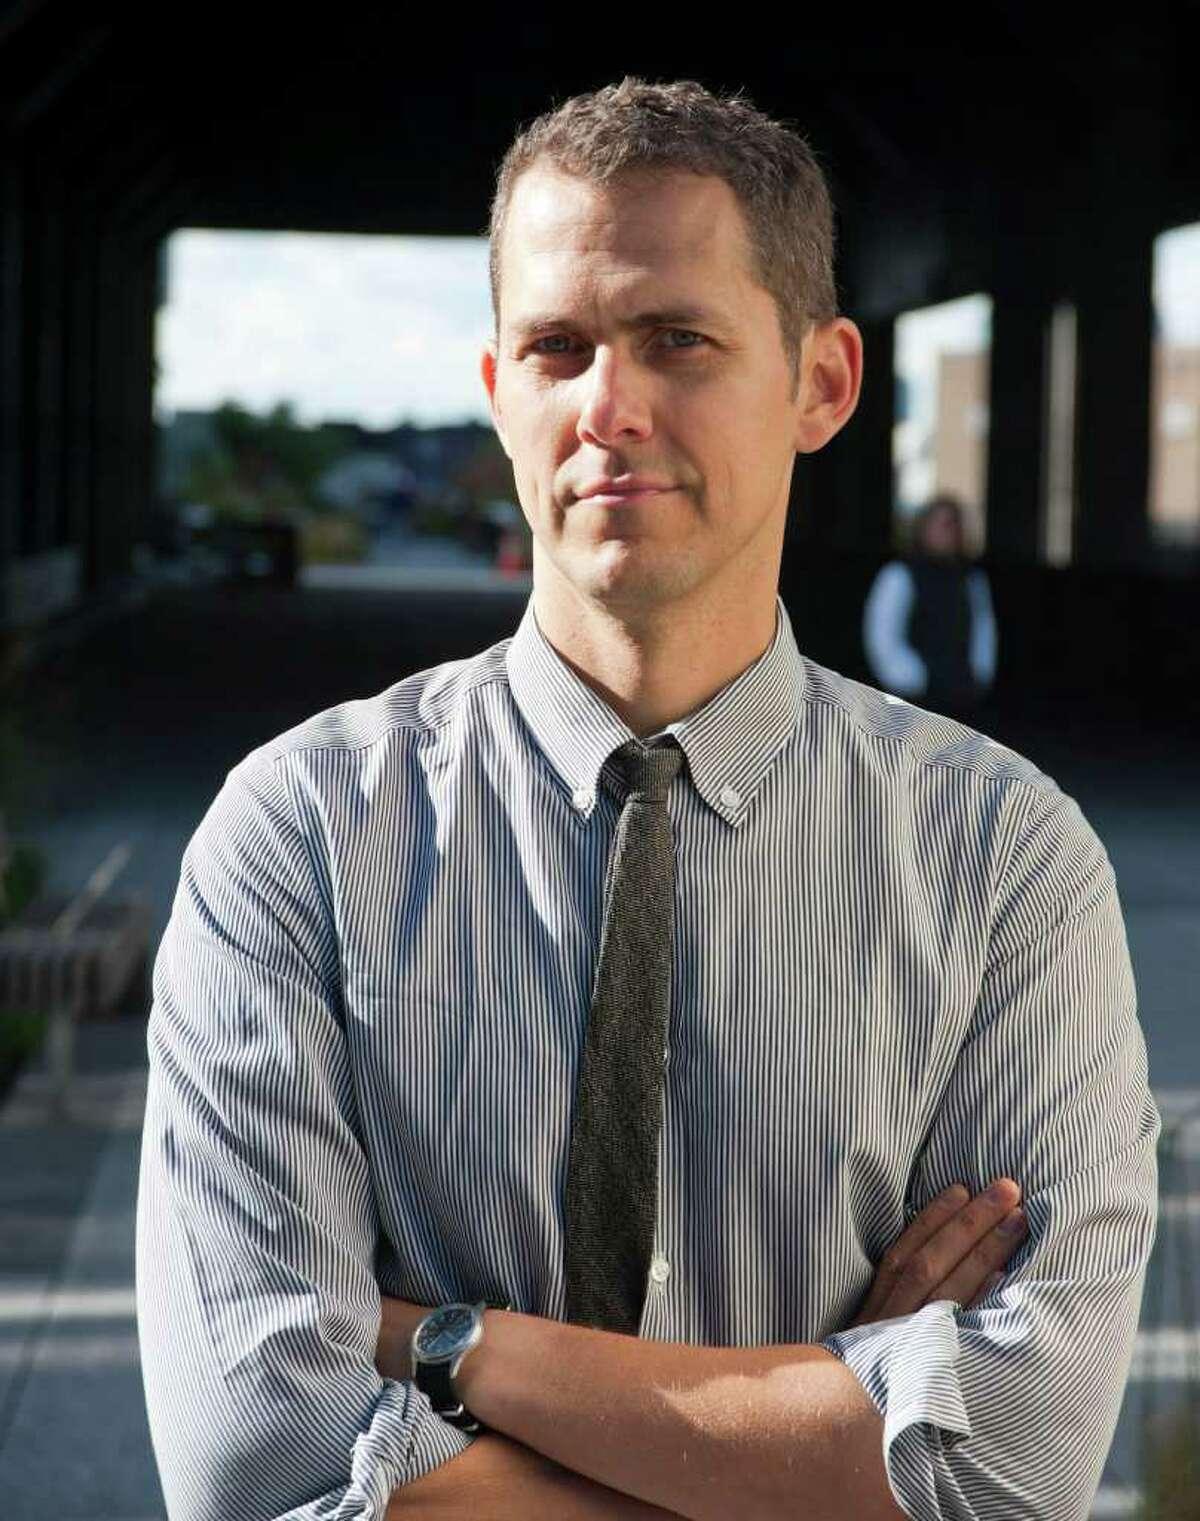 San Antonio native Robert Hammond is co-developer of the High Line park in New York.